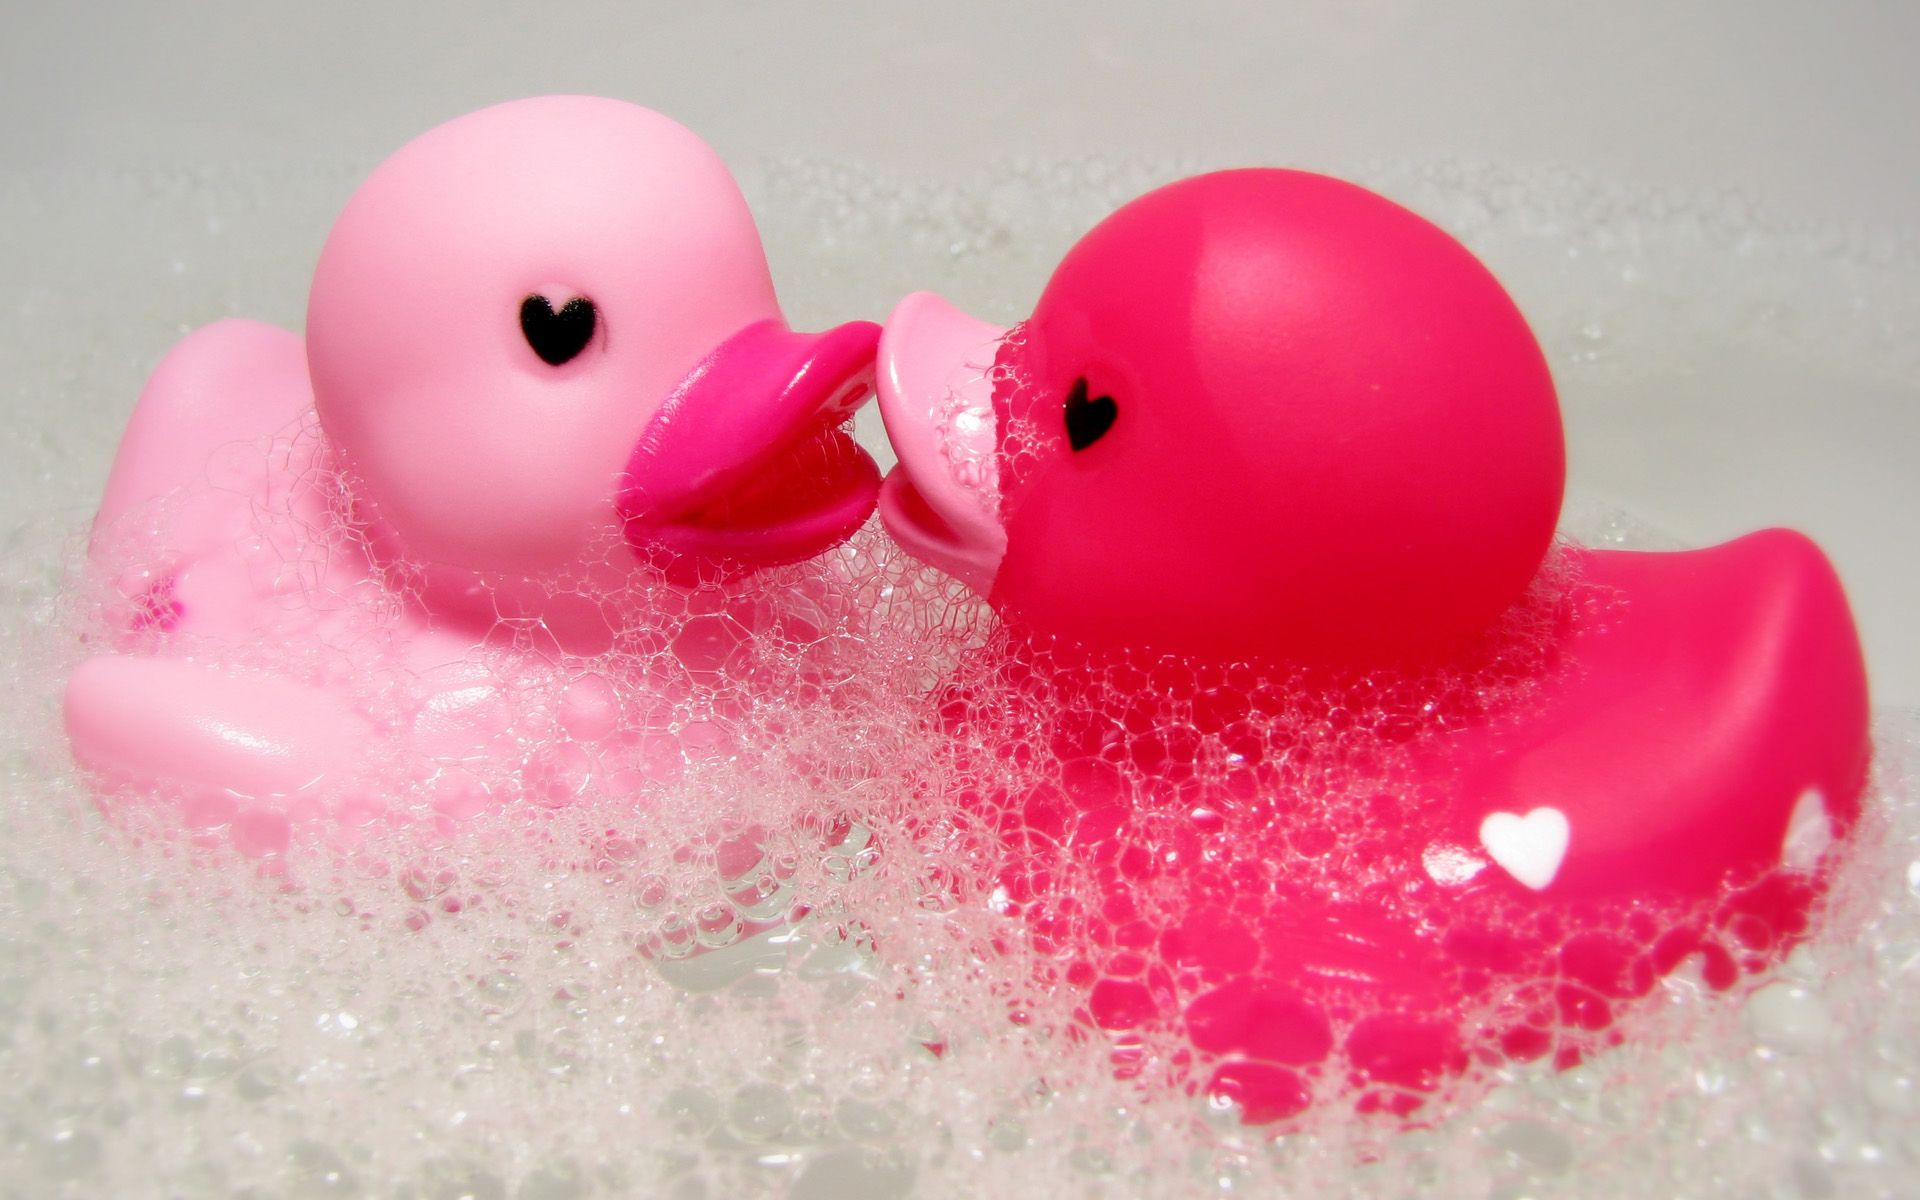 Otc 12 Pink Ribbon Rubber Ducks//Breast Cancer Awareness//Duckies//Fund Raising//Inspiration